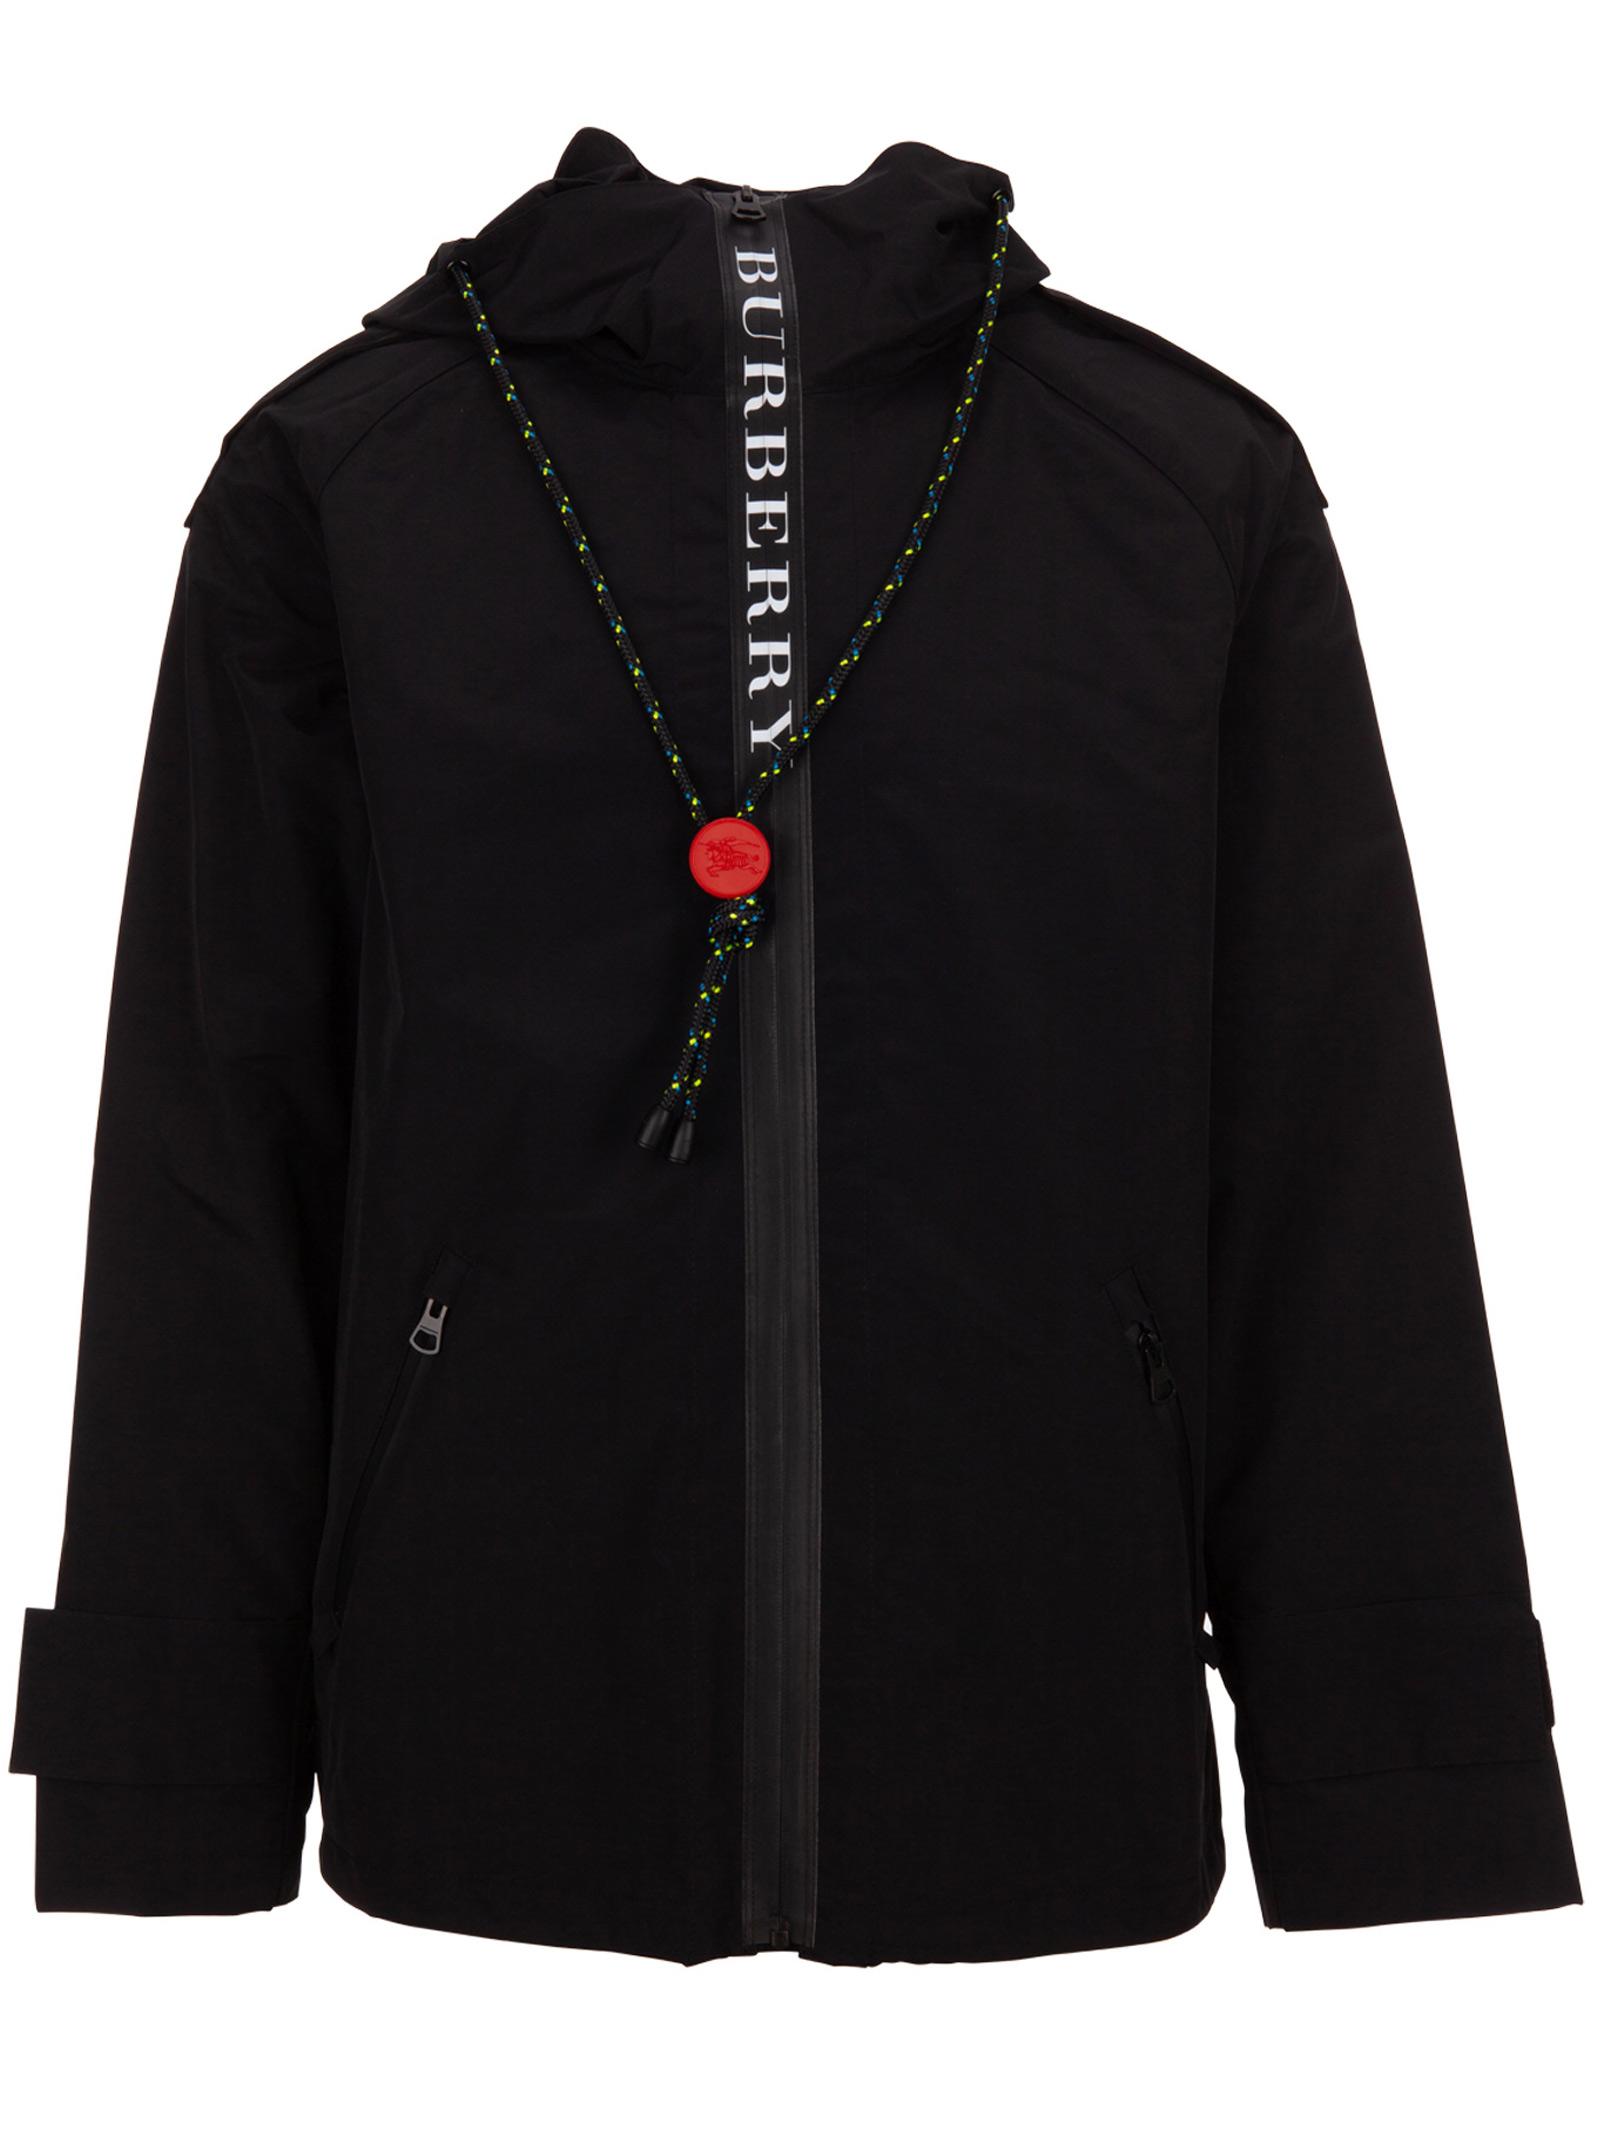 e4e92e703ad8 Michele Franzese Moda. 0. Burberry jacket BURBERRY